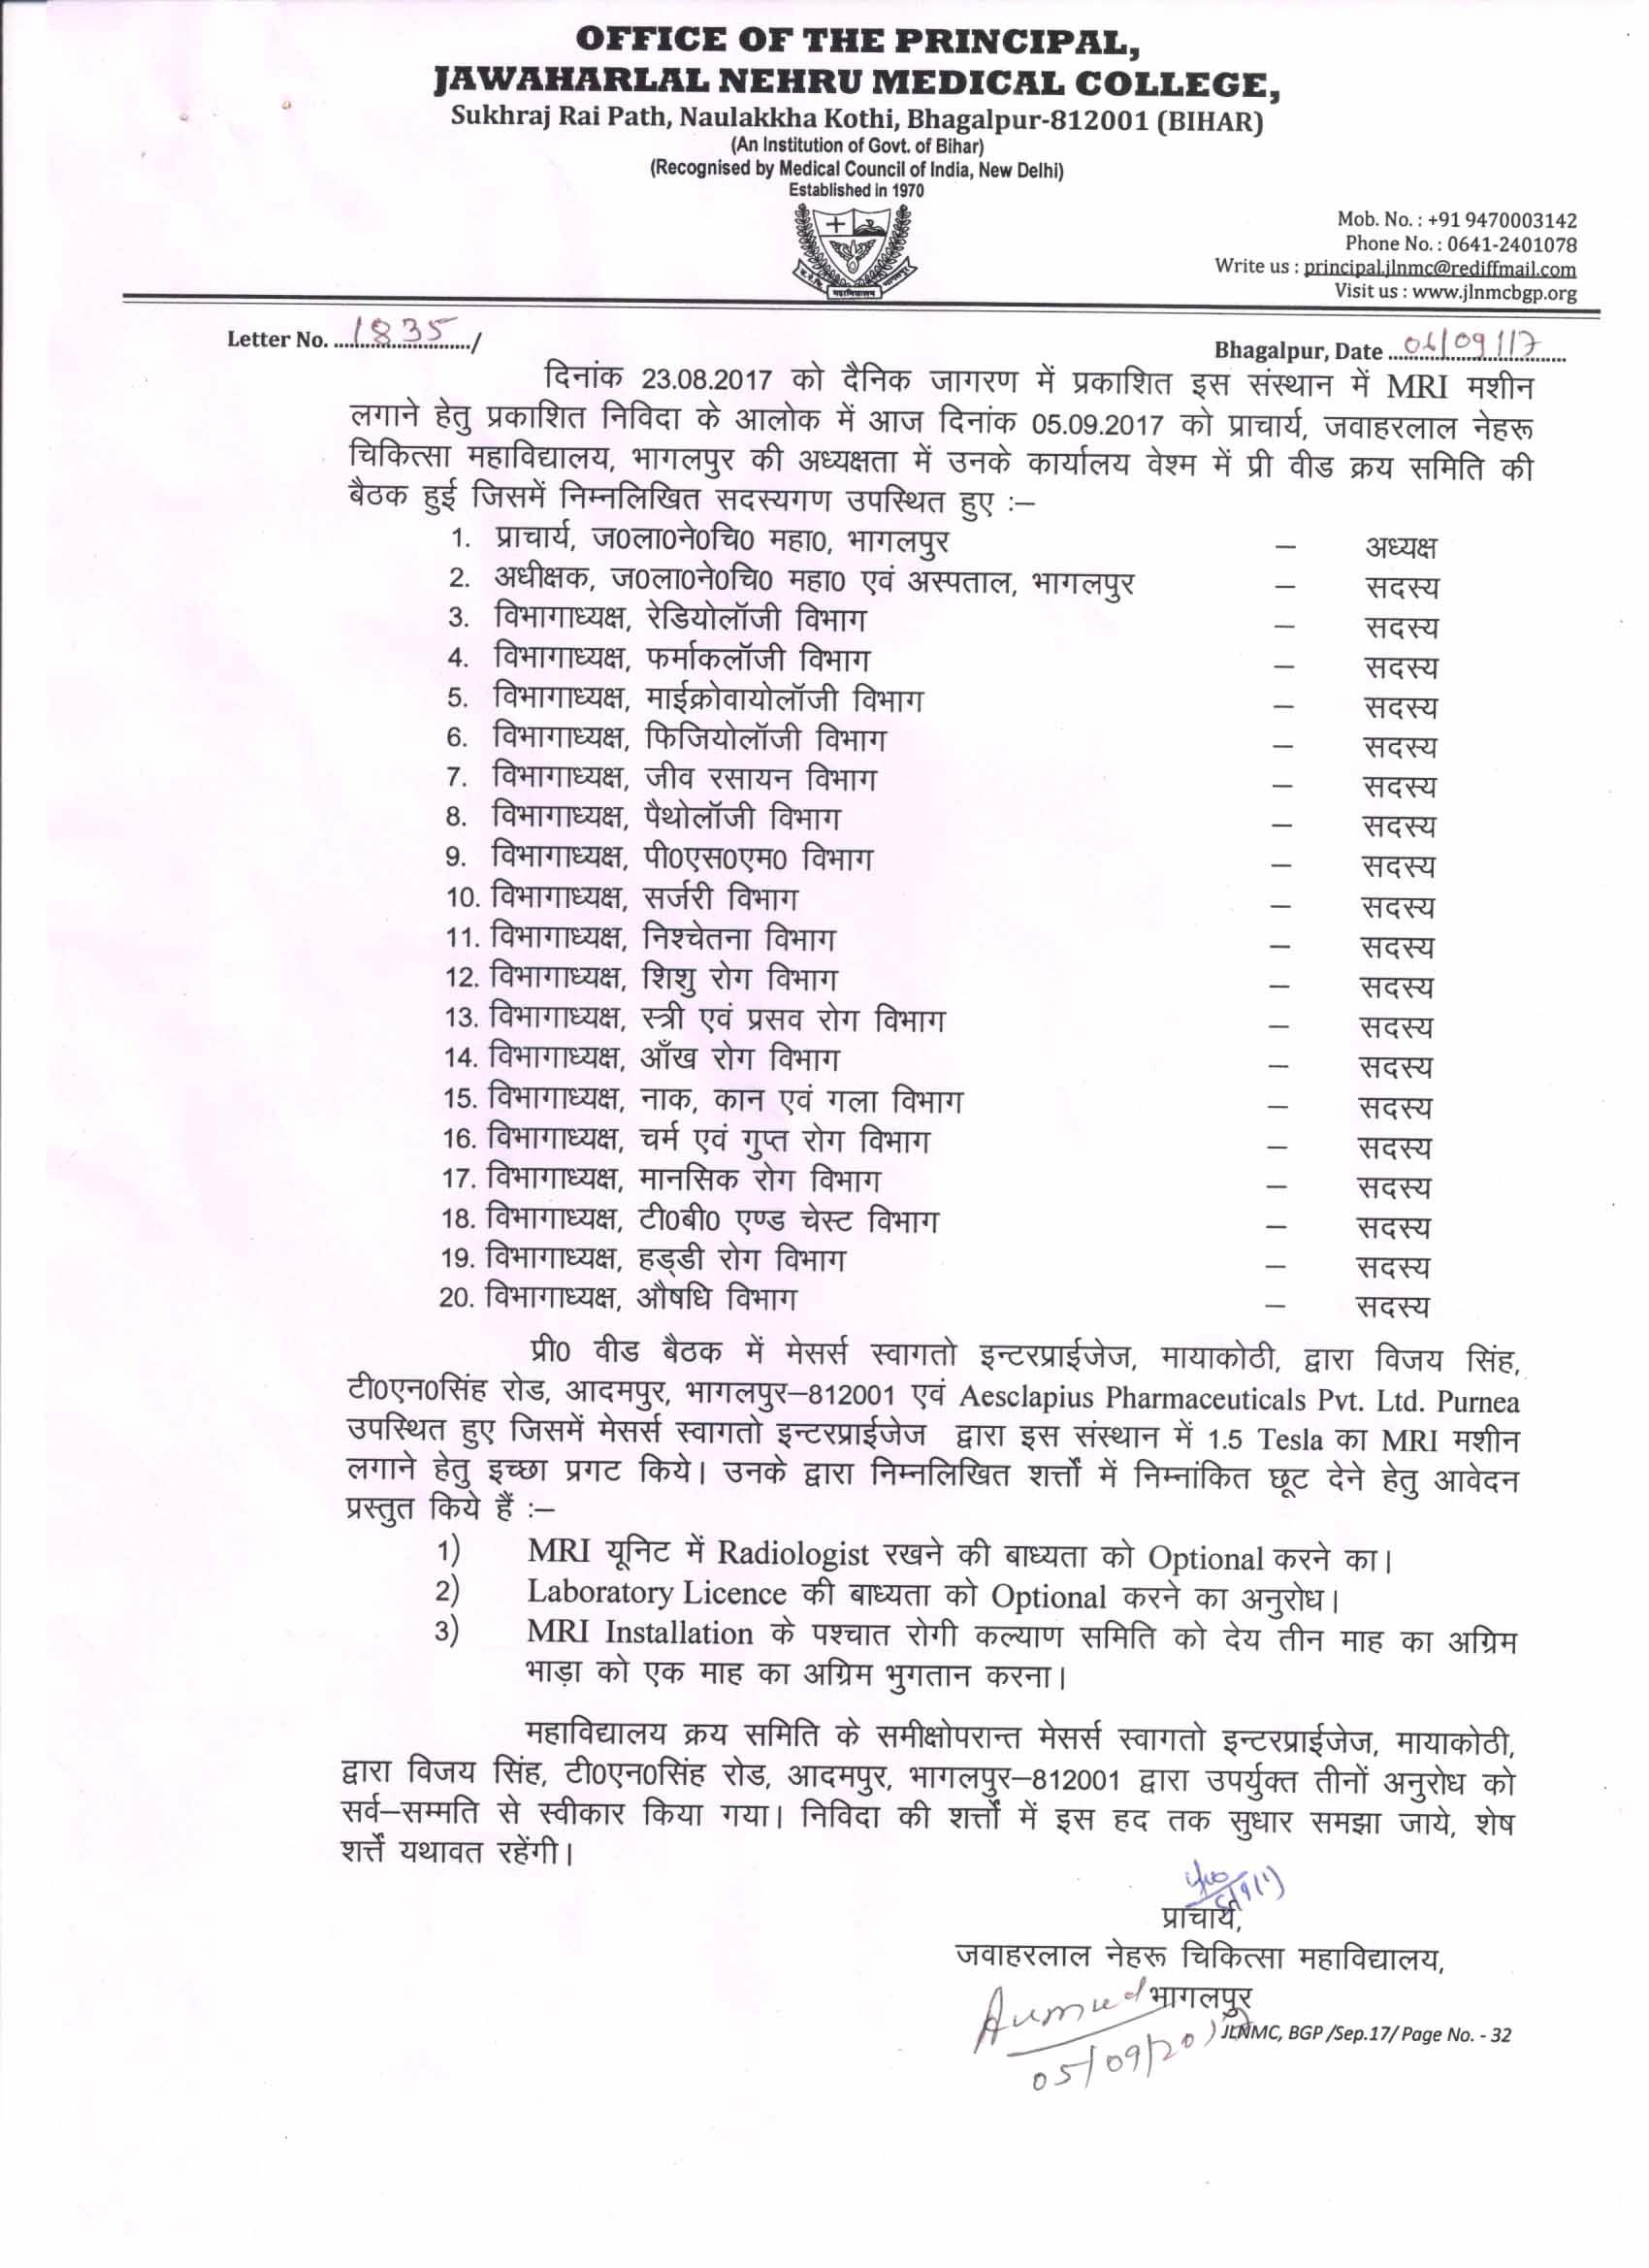 Jawahar Lal Nehru Medical College Bhagalpur